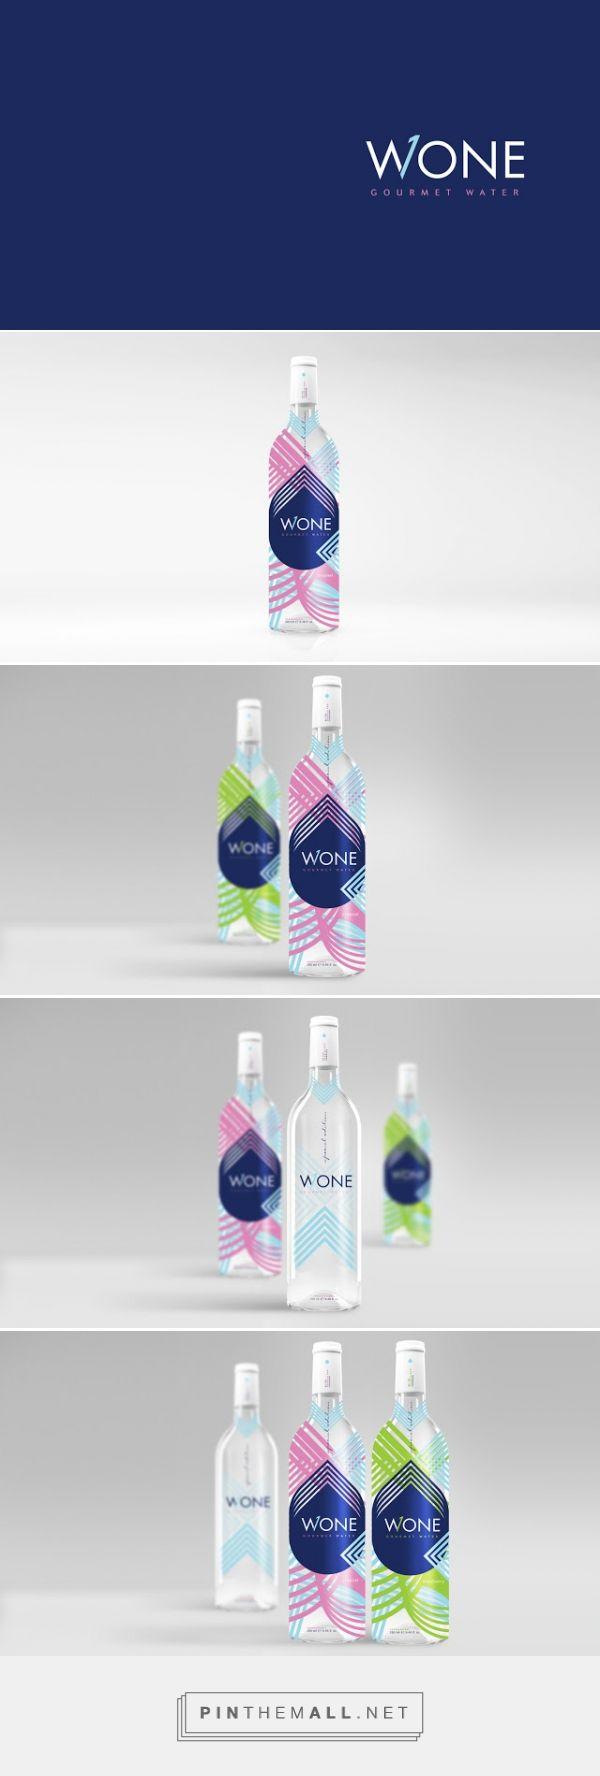 WONE gourmet #water #packaging designed by Agência BUD…